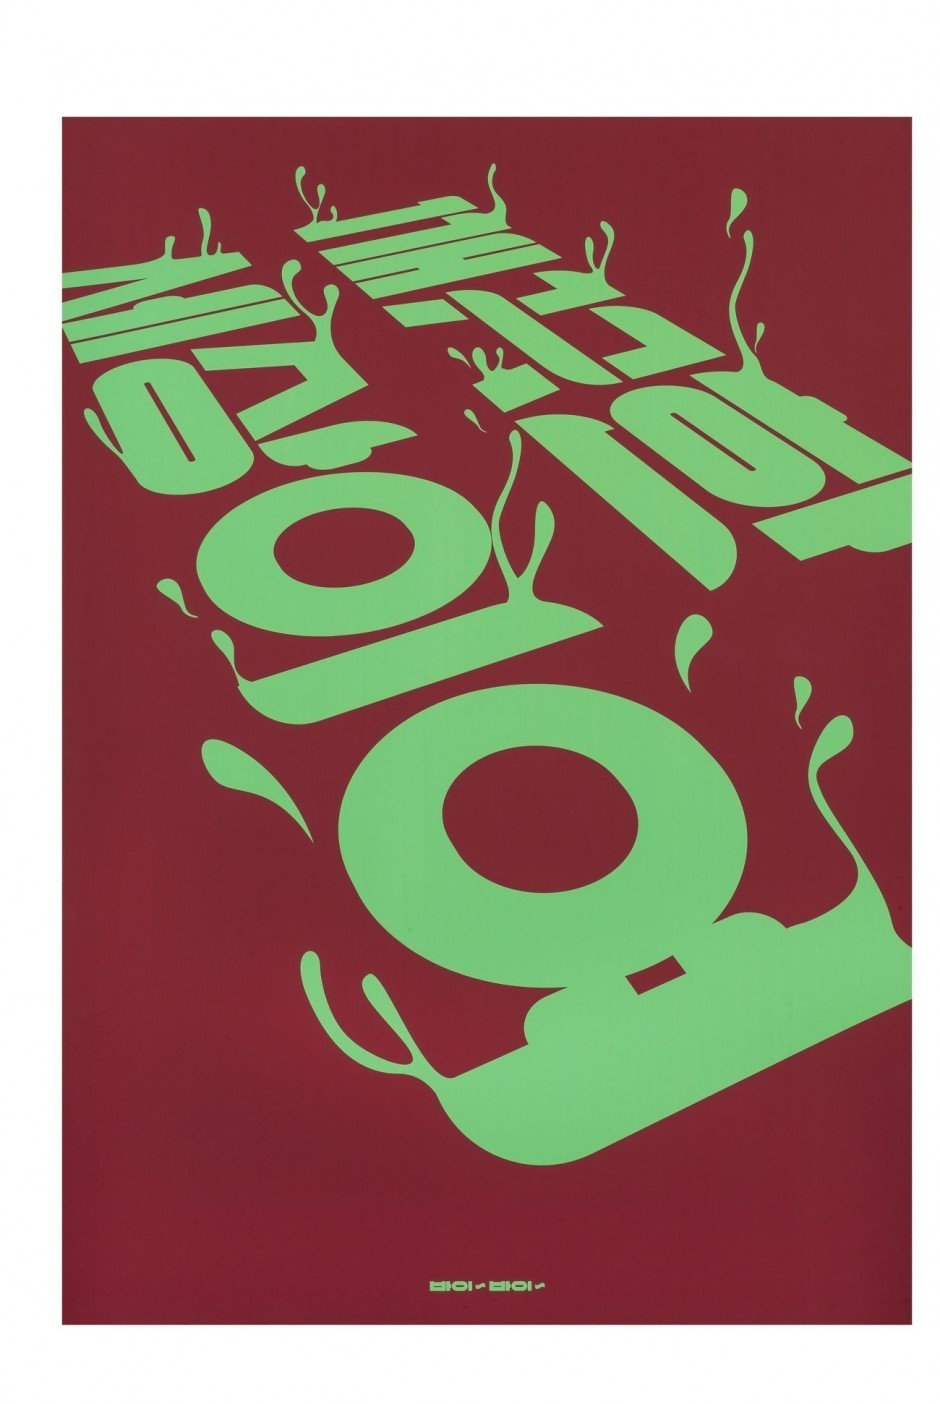 KIM Bo-huy, Nettoyer le monde!, Poster, 2014